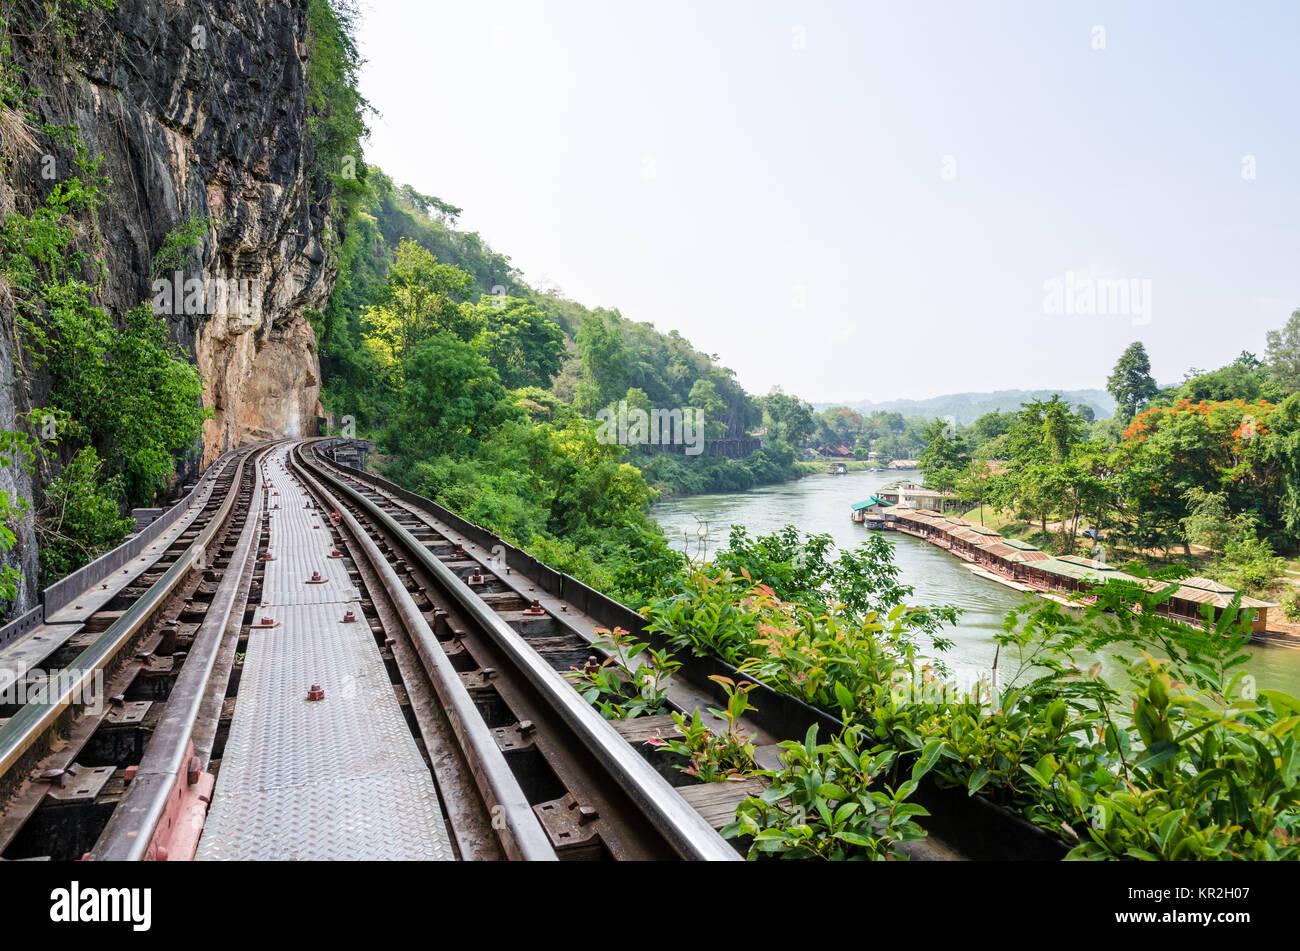 Death Railway bridge over the Kwai Noi river - Stock Image